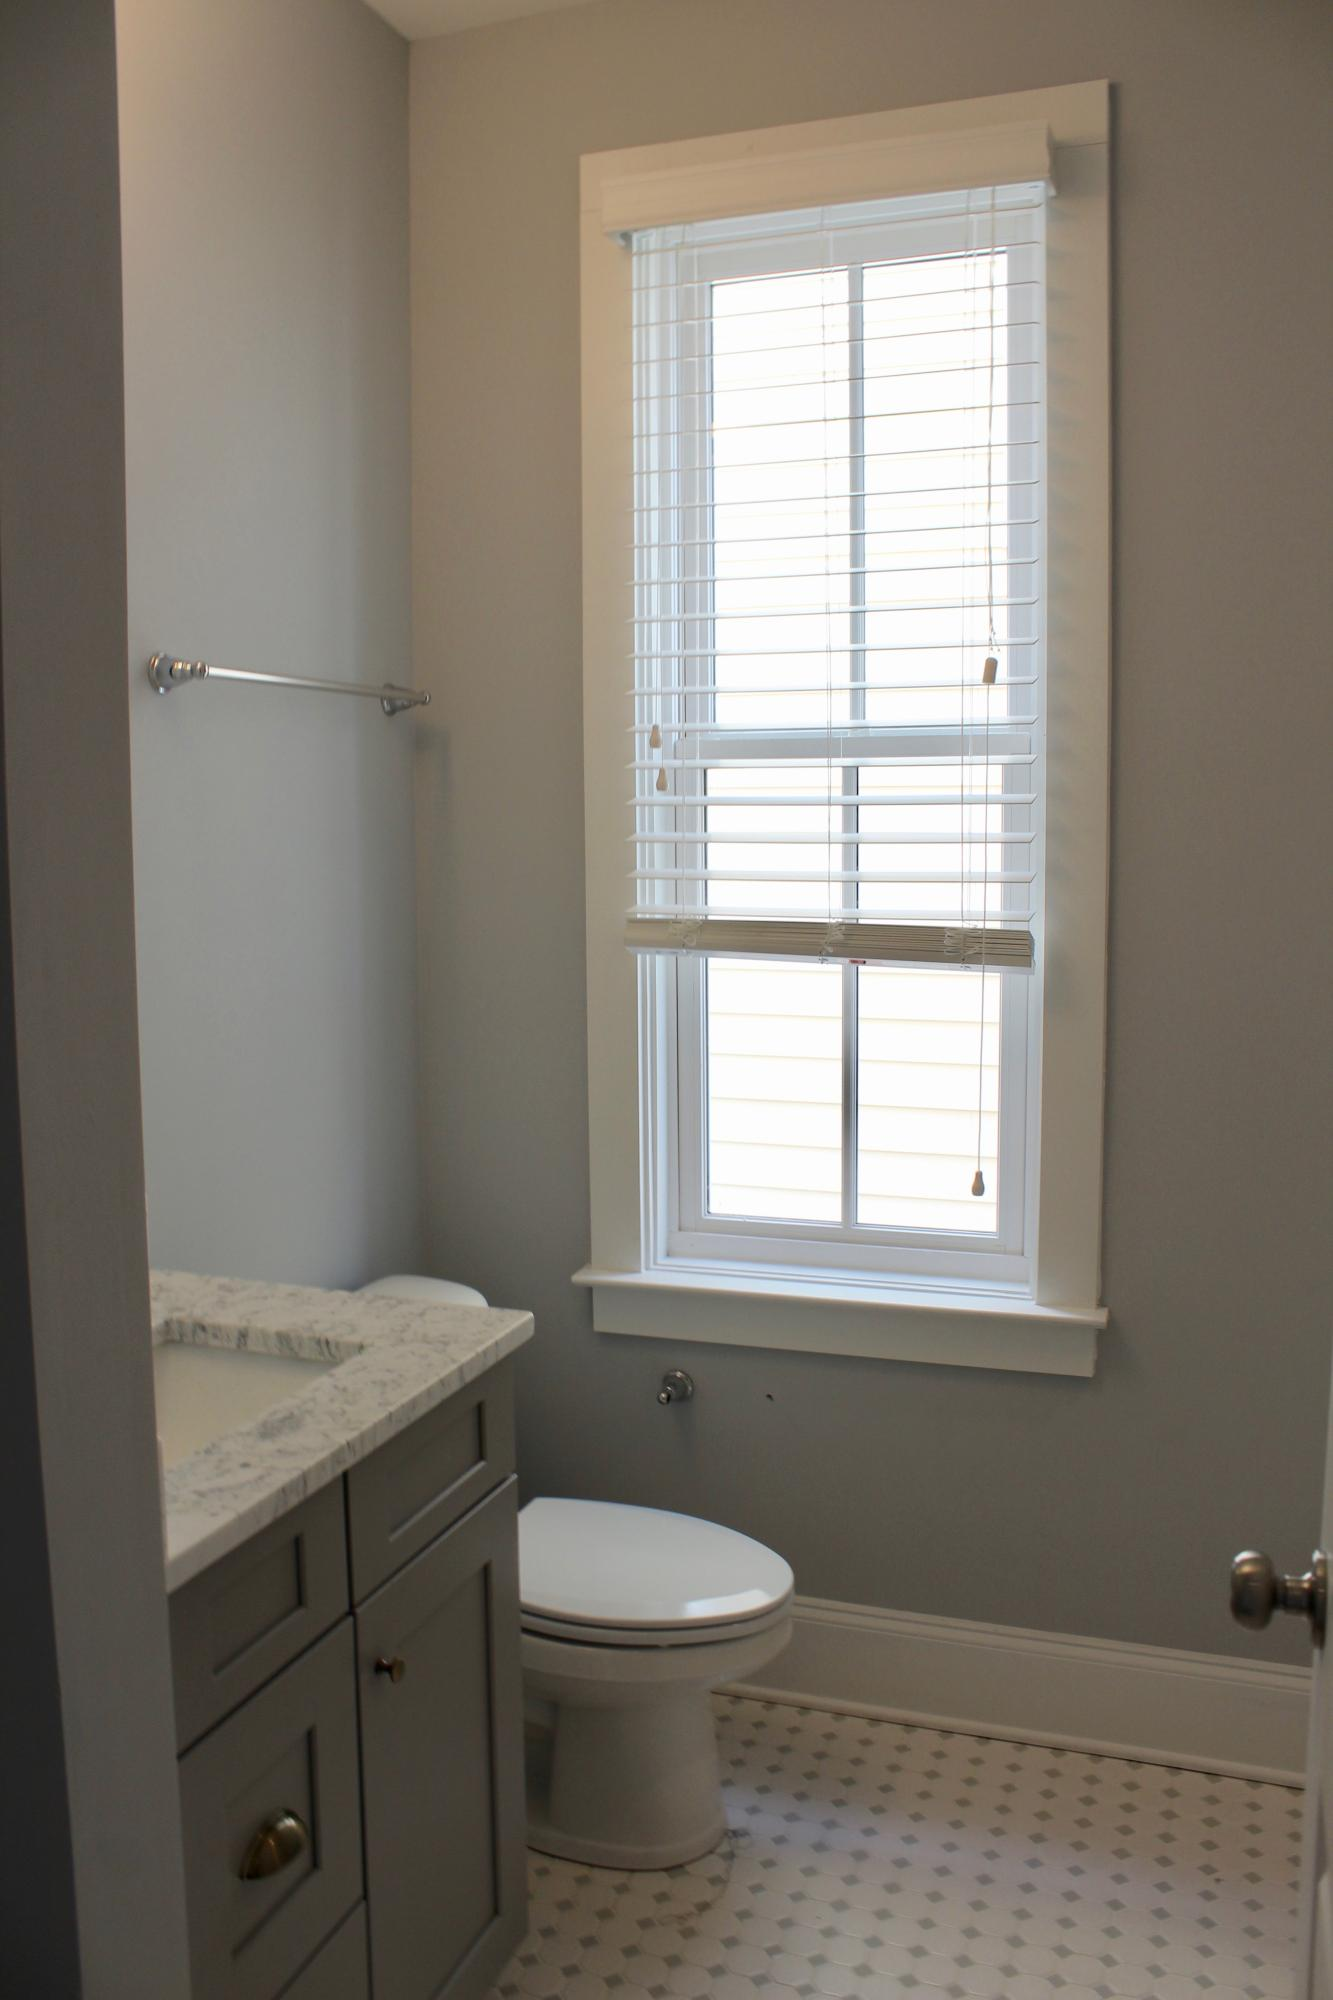 Morris Square Homes For Sale - 46 Dereef, Charleston, SC - 33